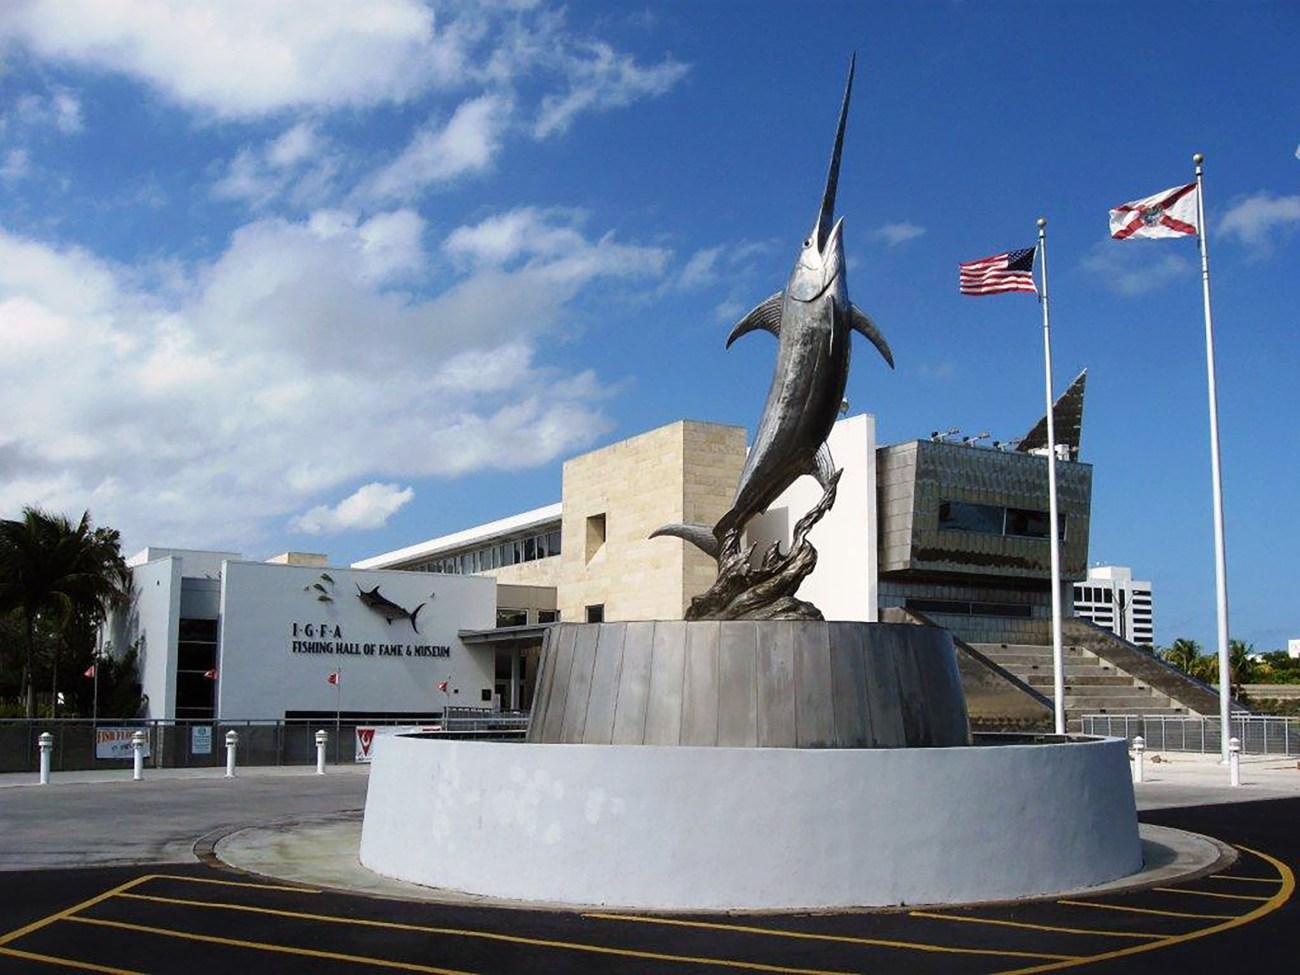 Cushman & Wakefield Brings International Game Fish Association's HQ to Market